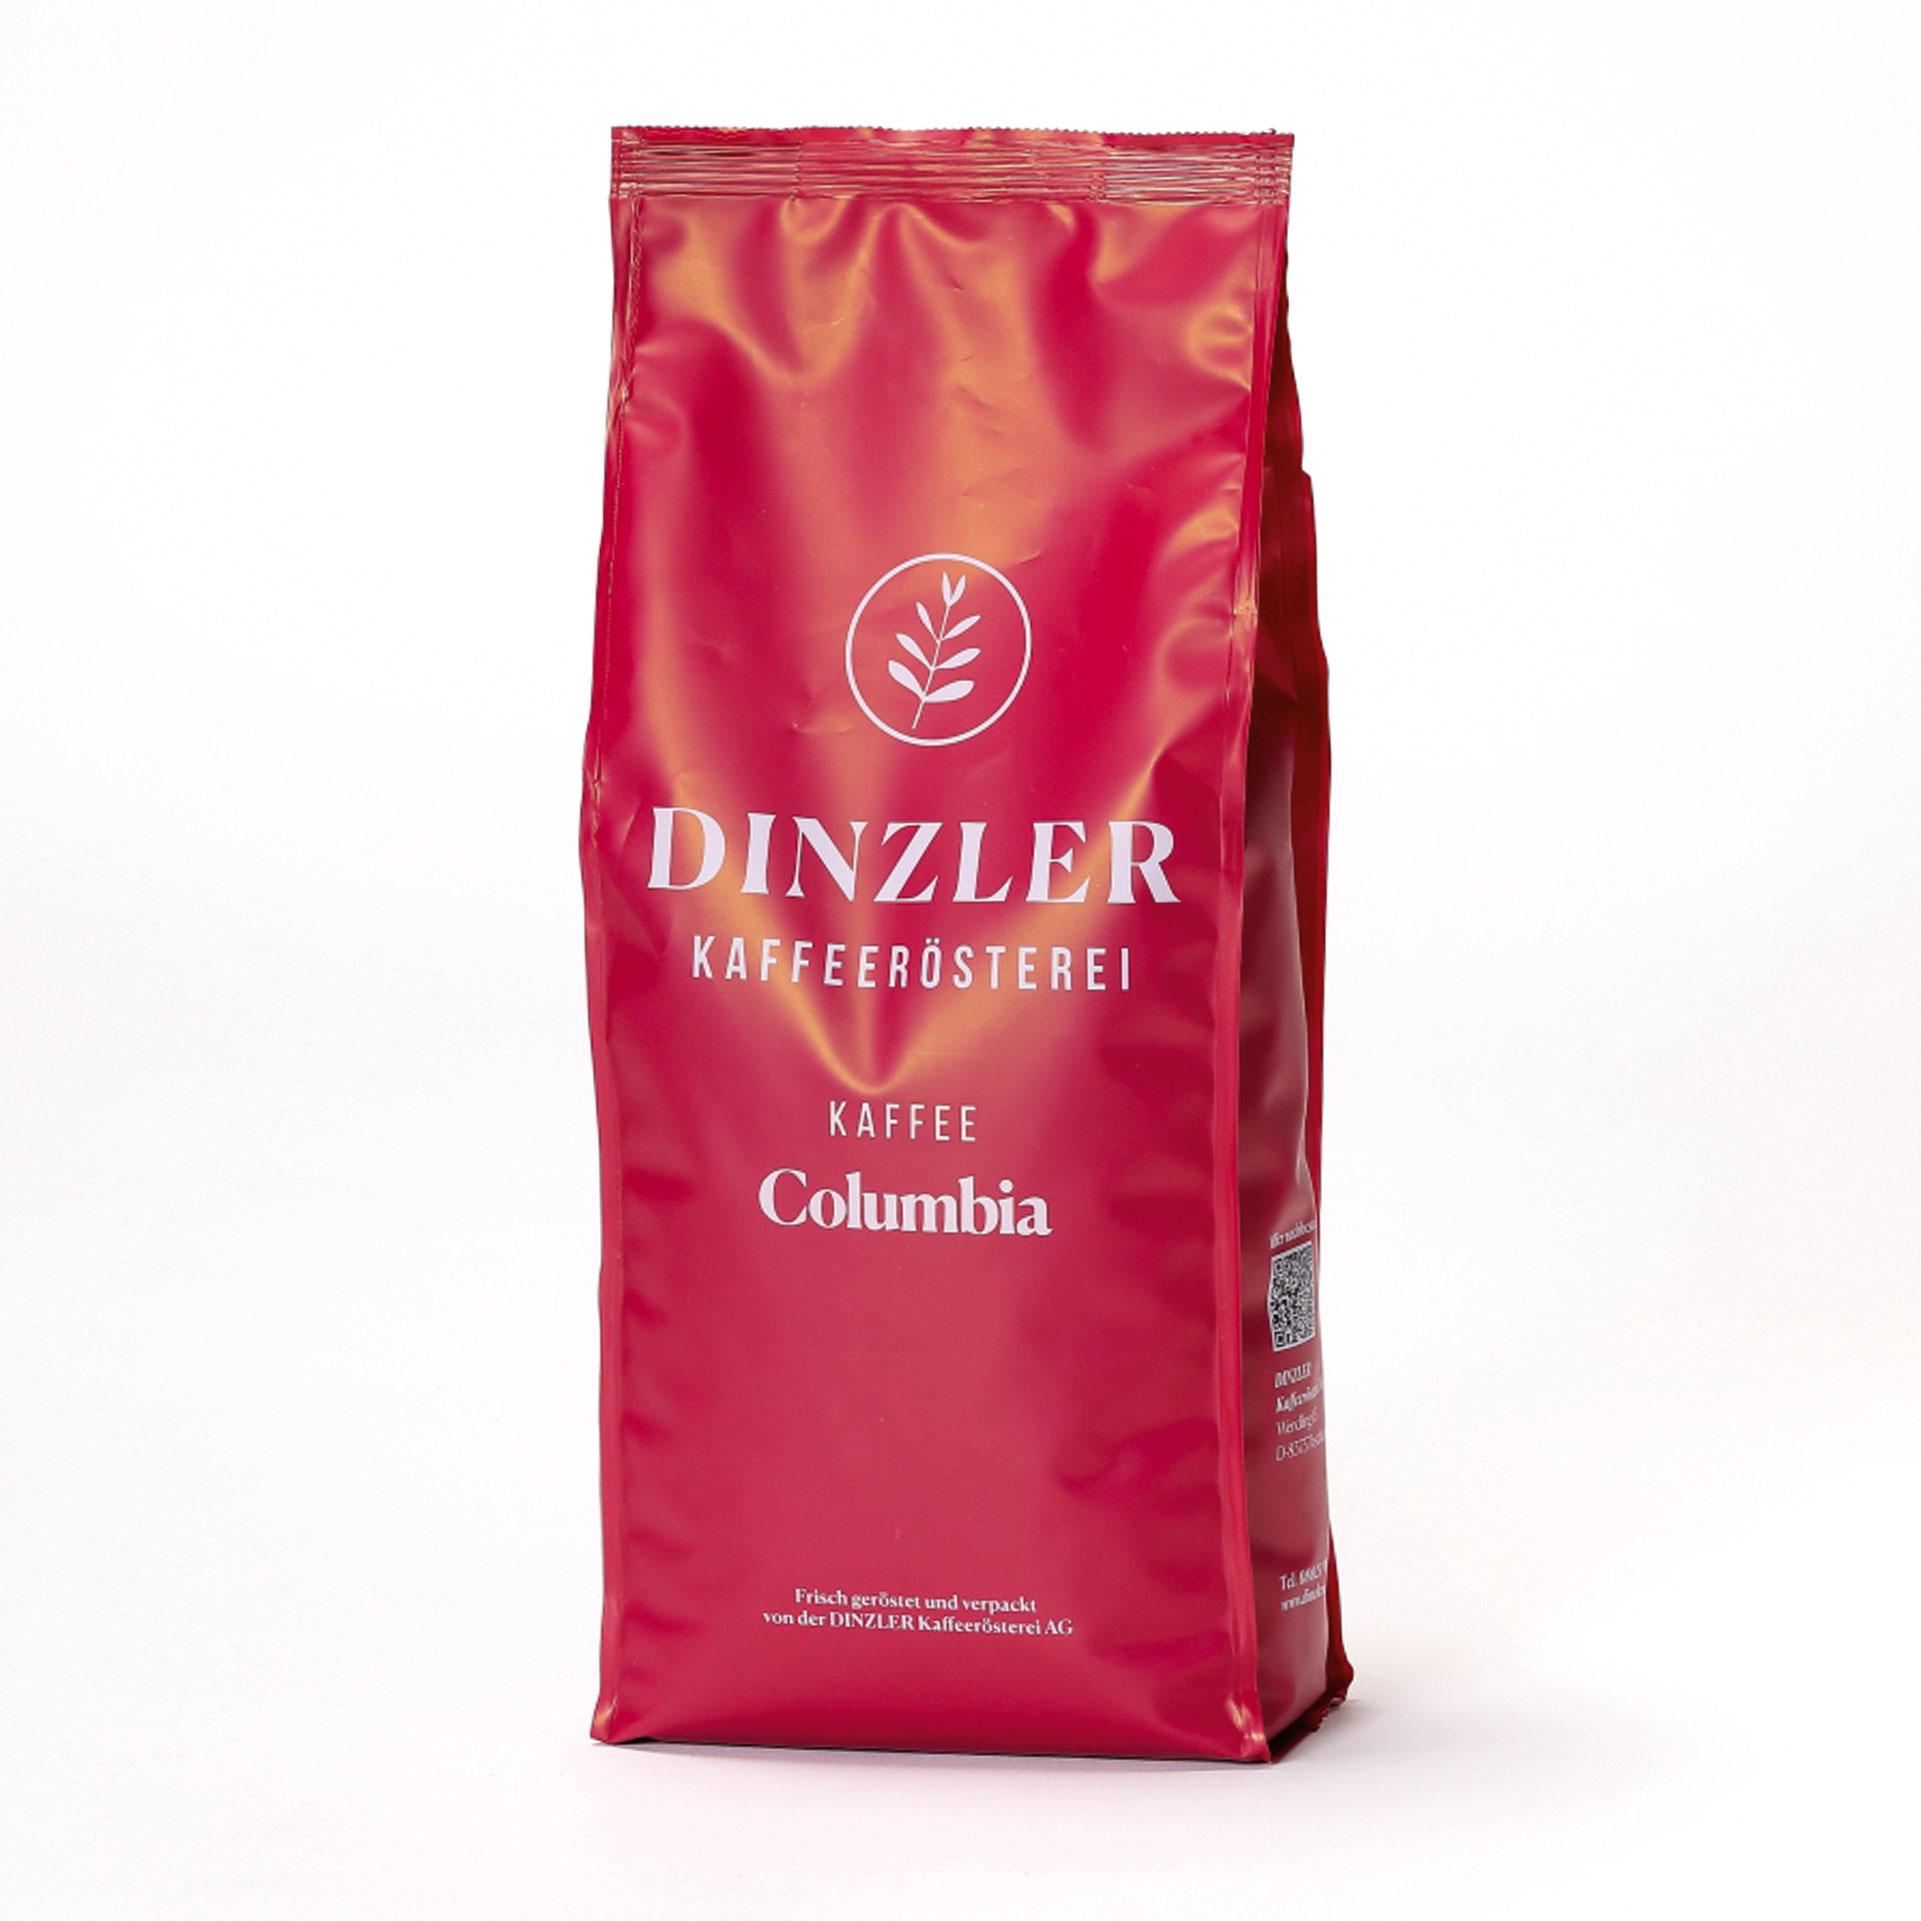 DINZLER Kaffee Columbia